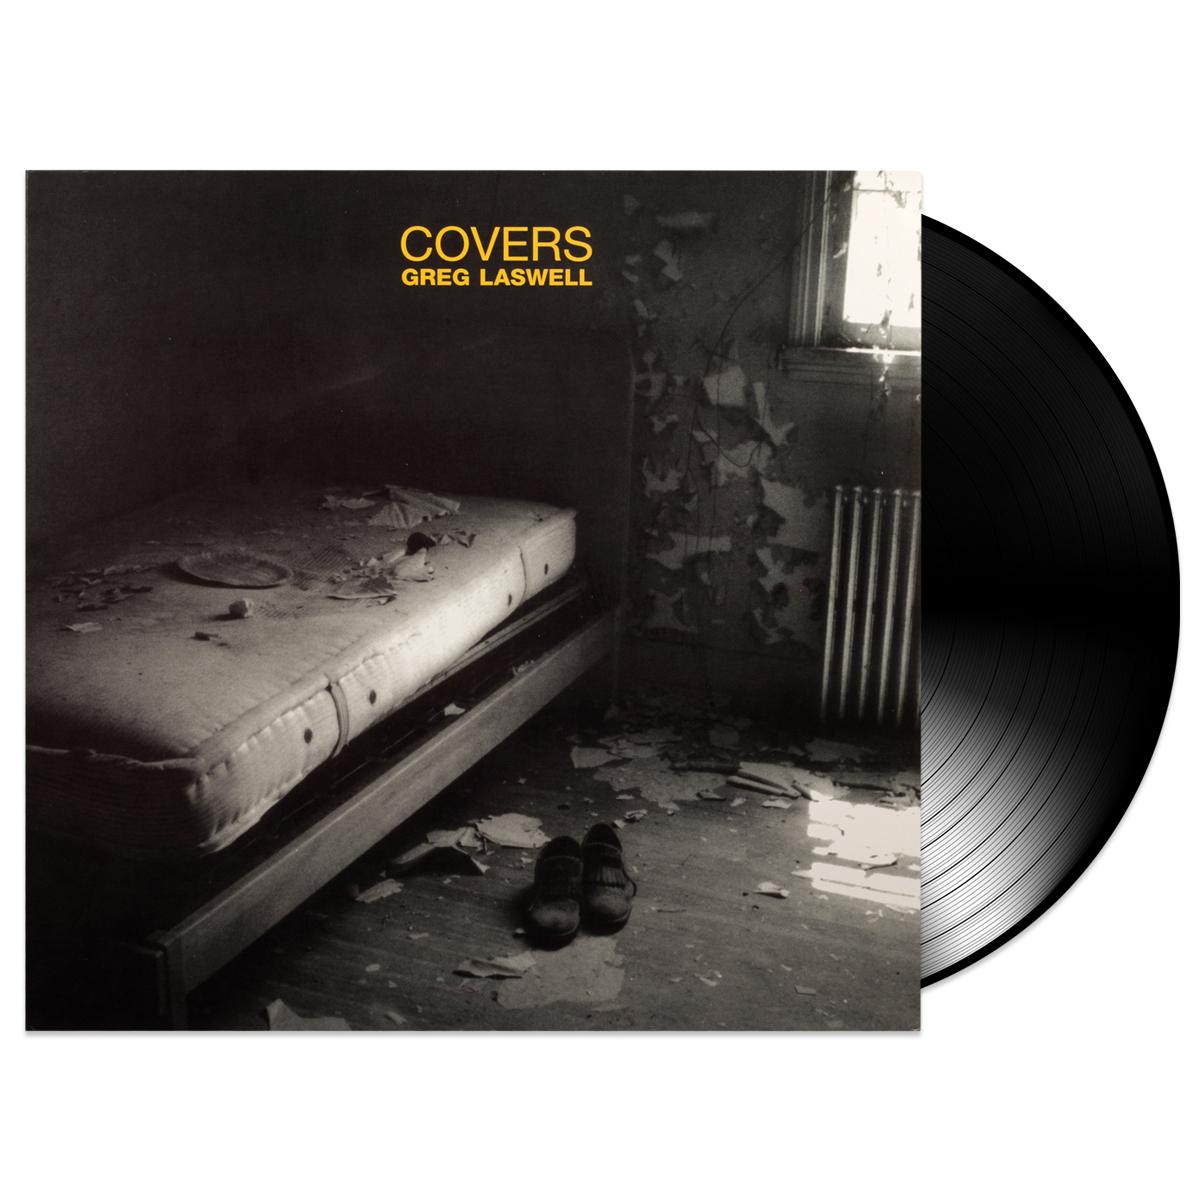 Covers Vinyl LP